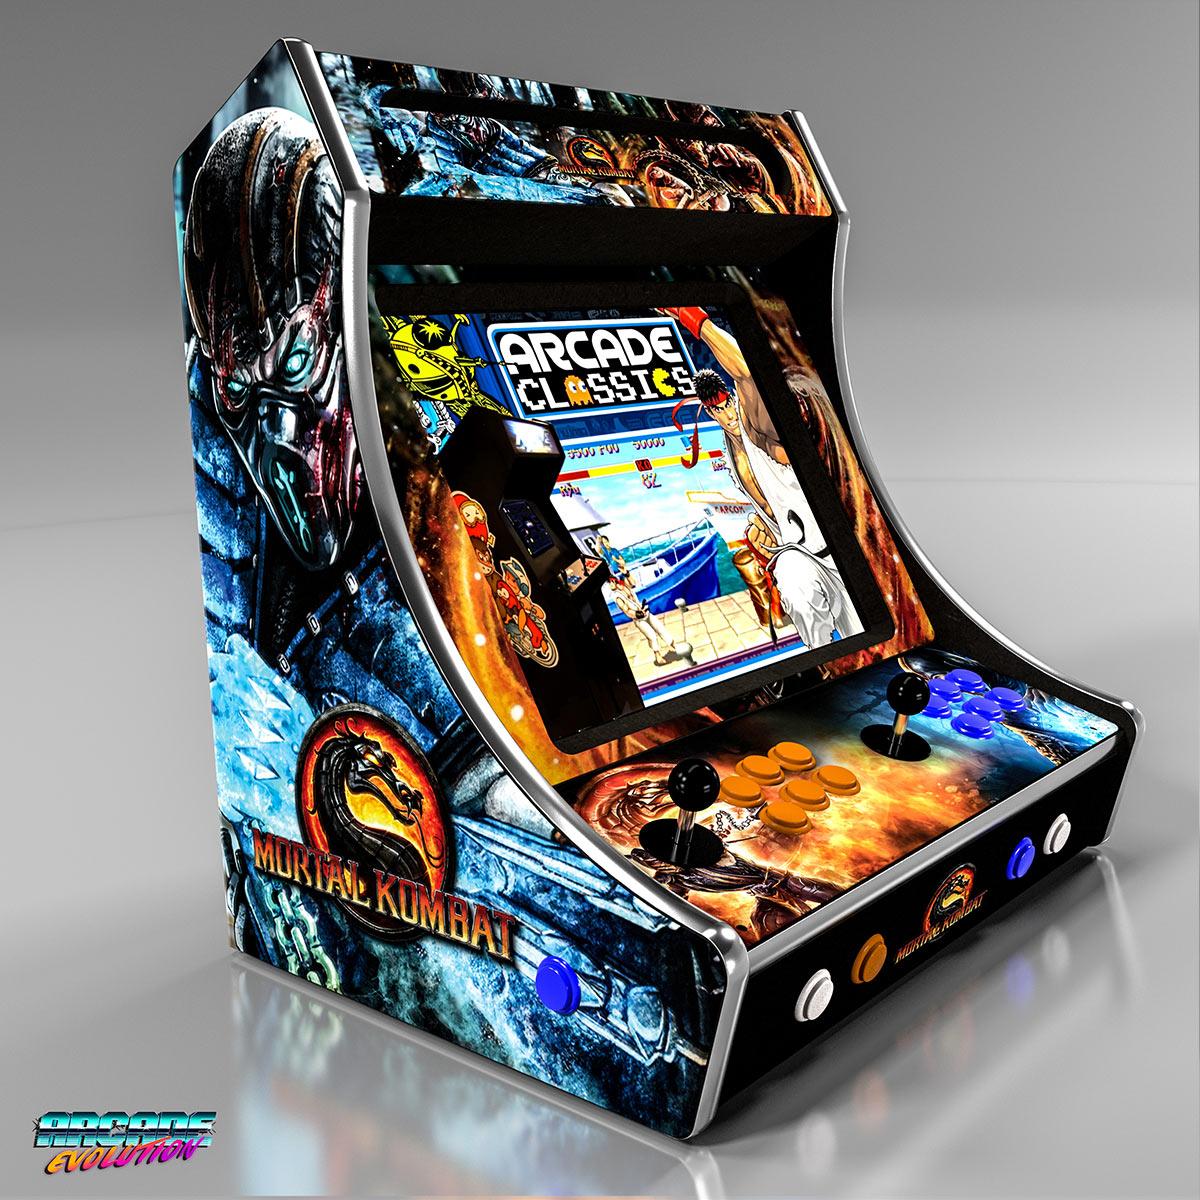 AE19B - Mortal Kombat